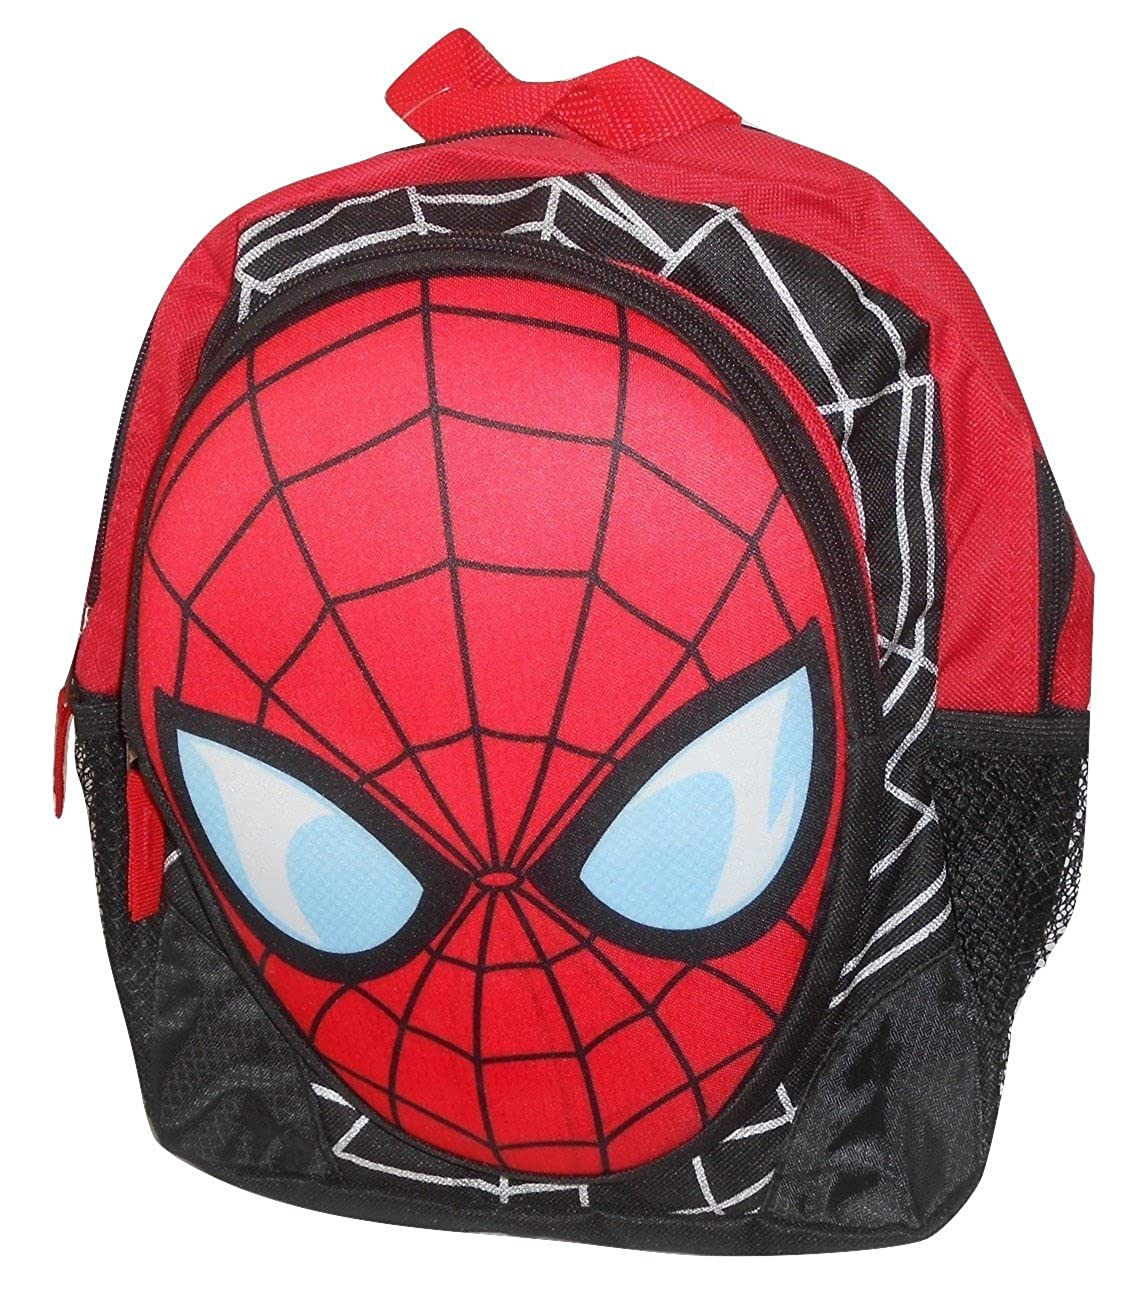 [Spiderman] ボーイズ US サイズ: S   B00R1DWWZU